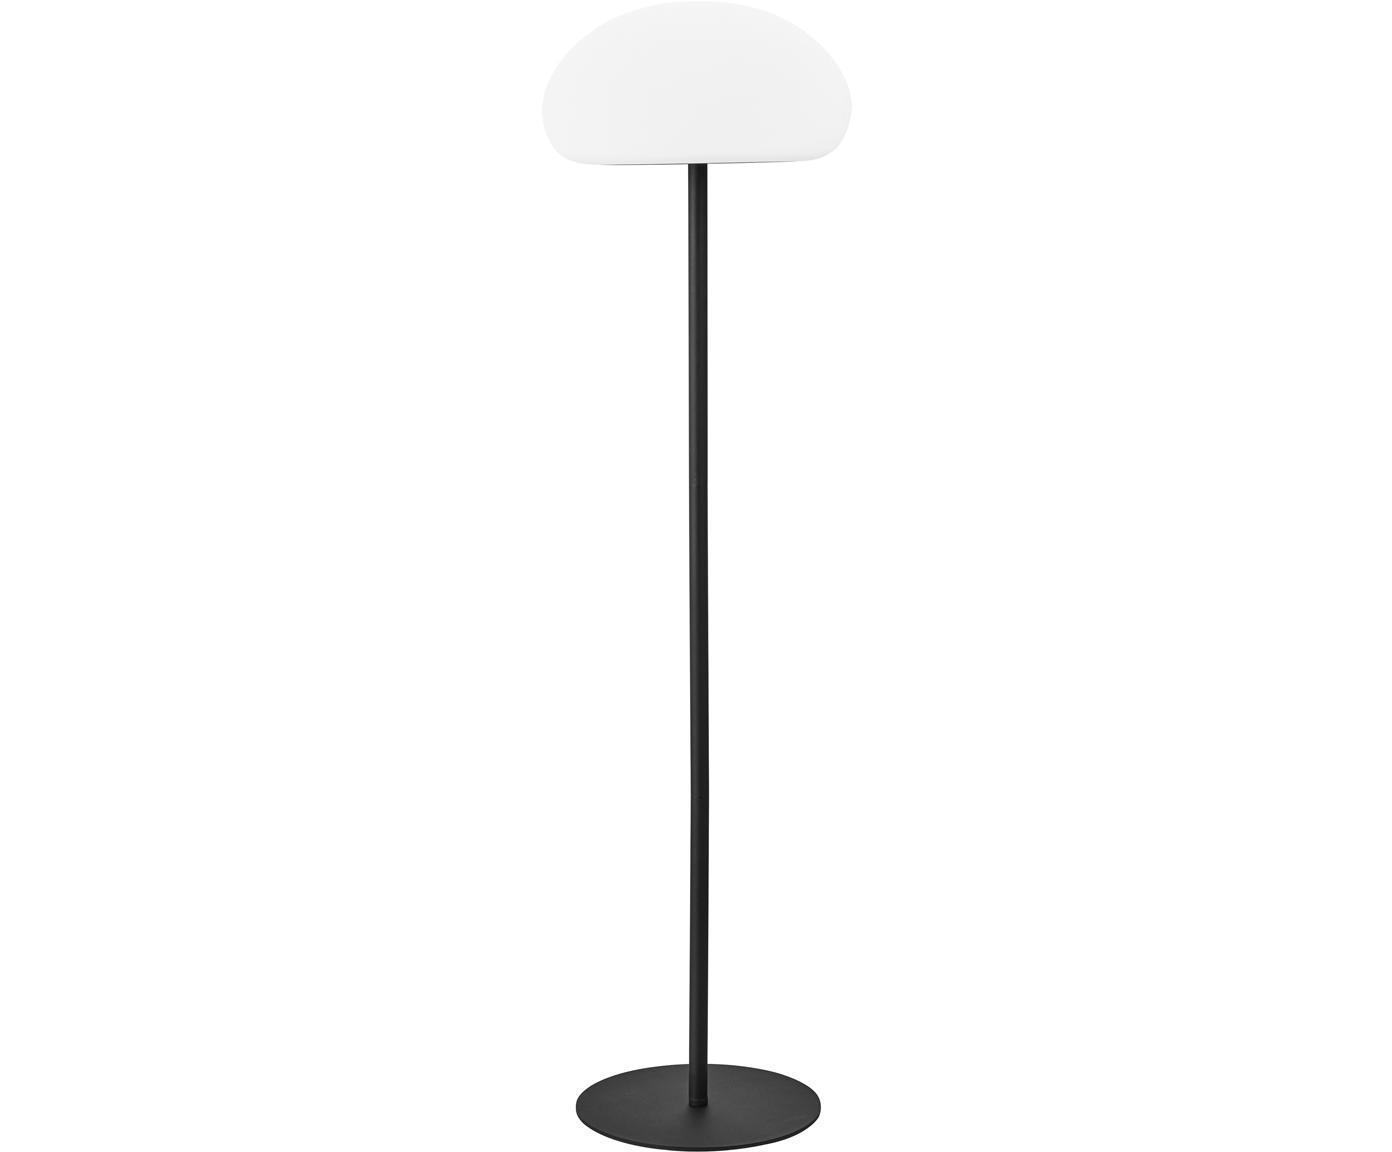 Dimbare outdoor LED vloerlamp Sponge, Kunststof (PVC), Wit, zwart, Ø 34 x H 126 cm